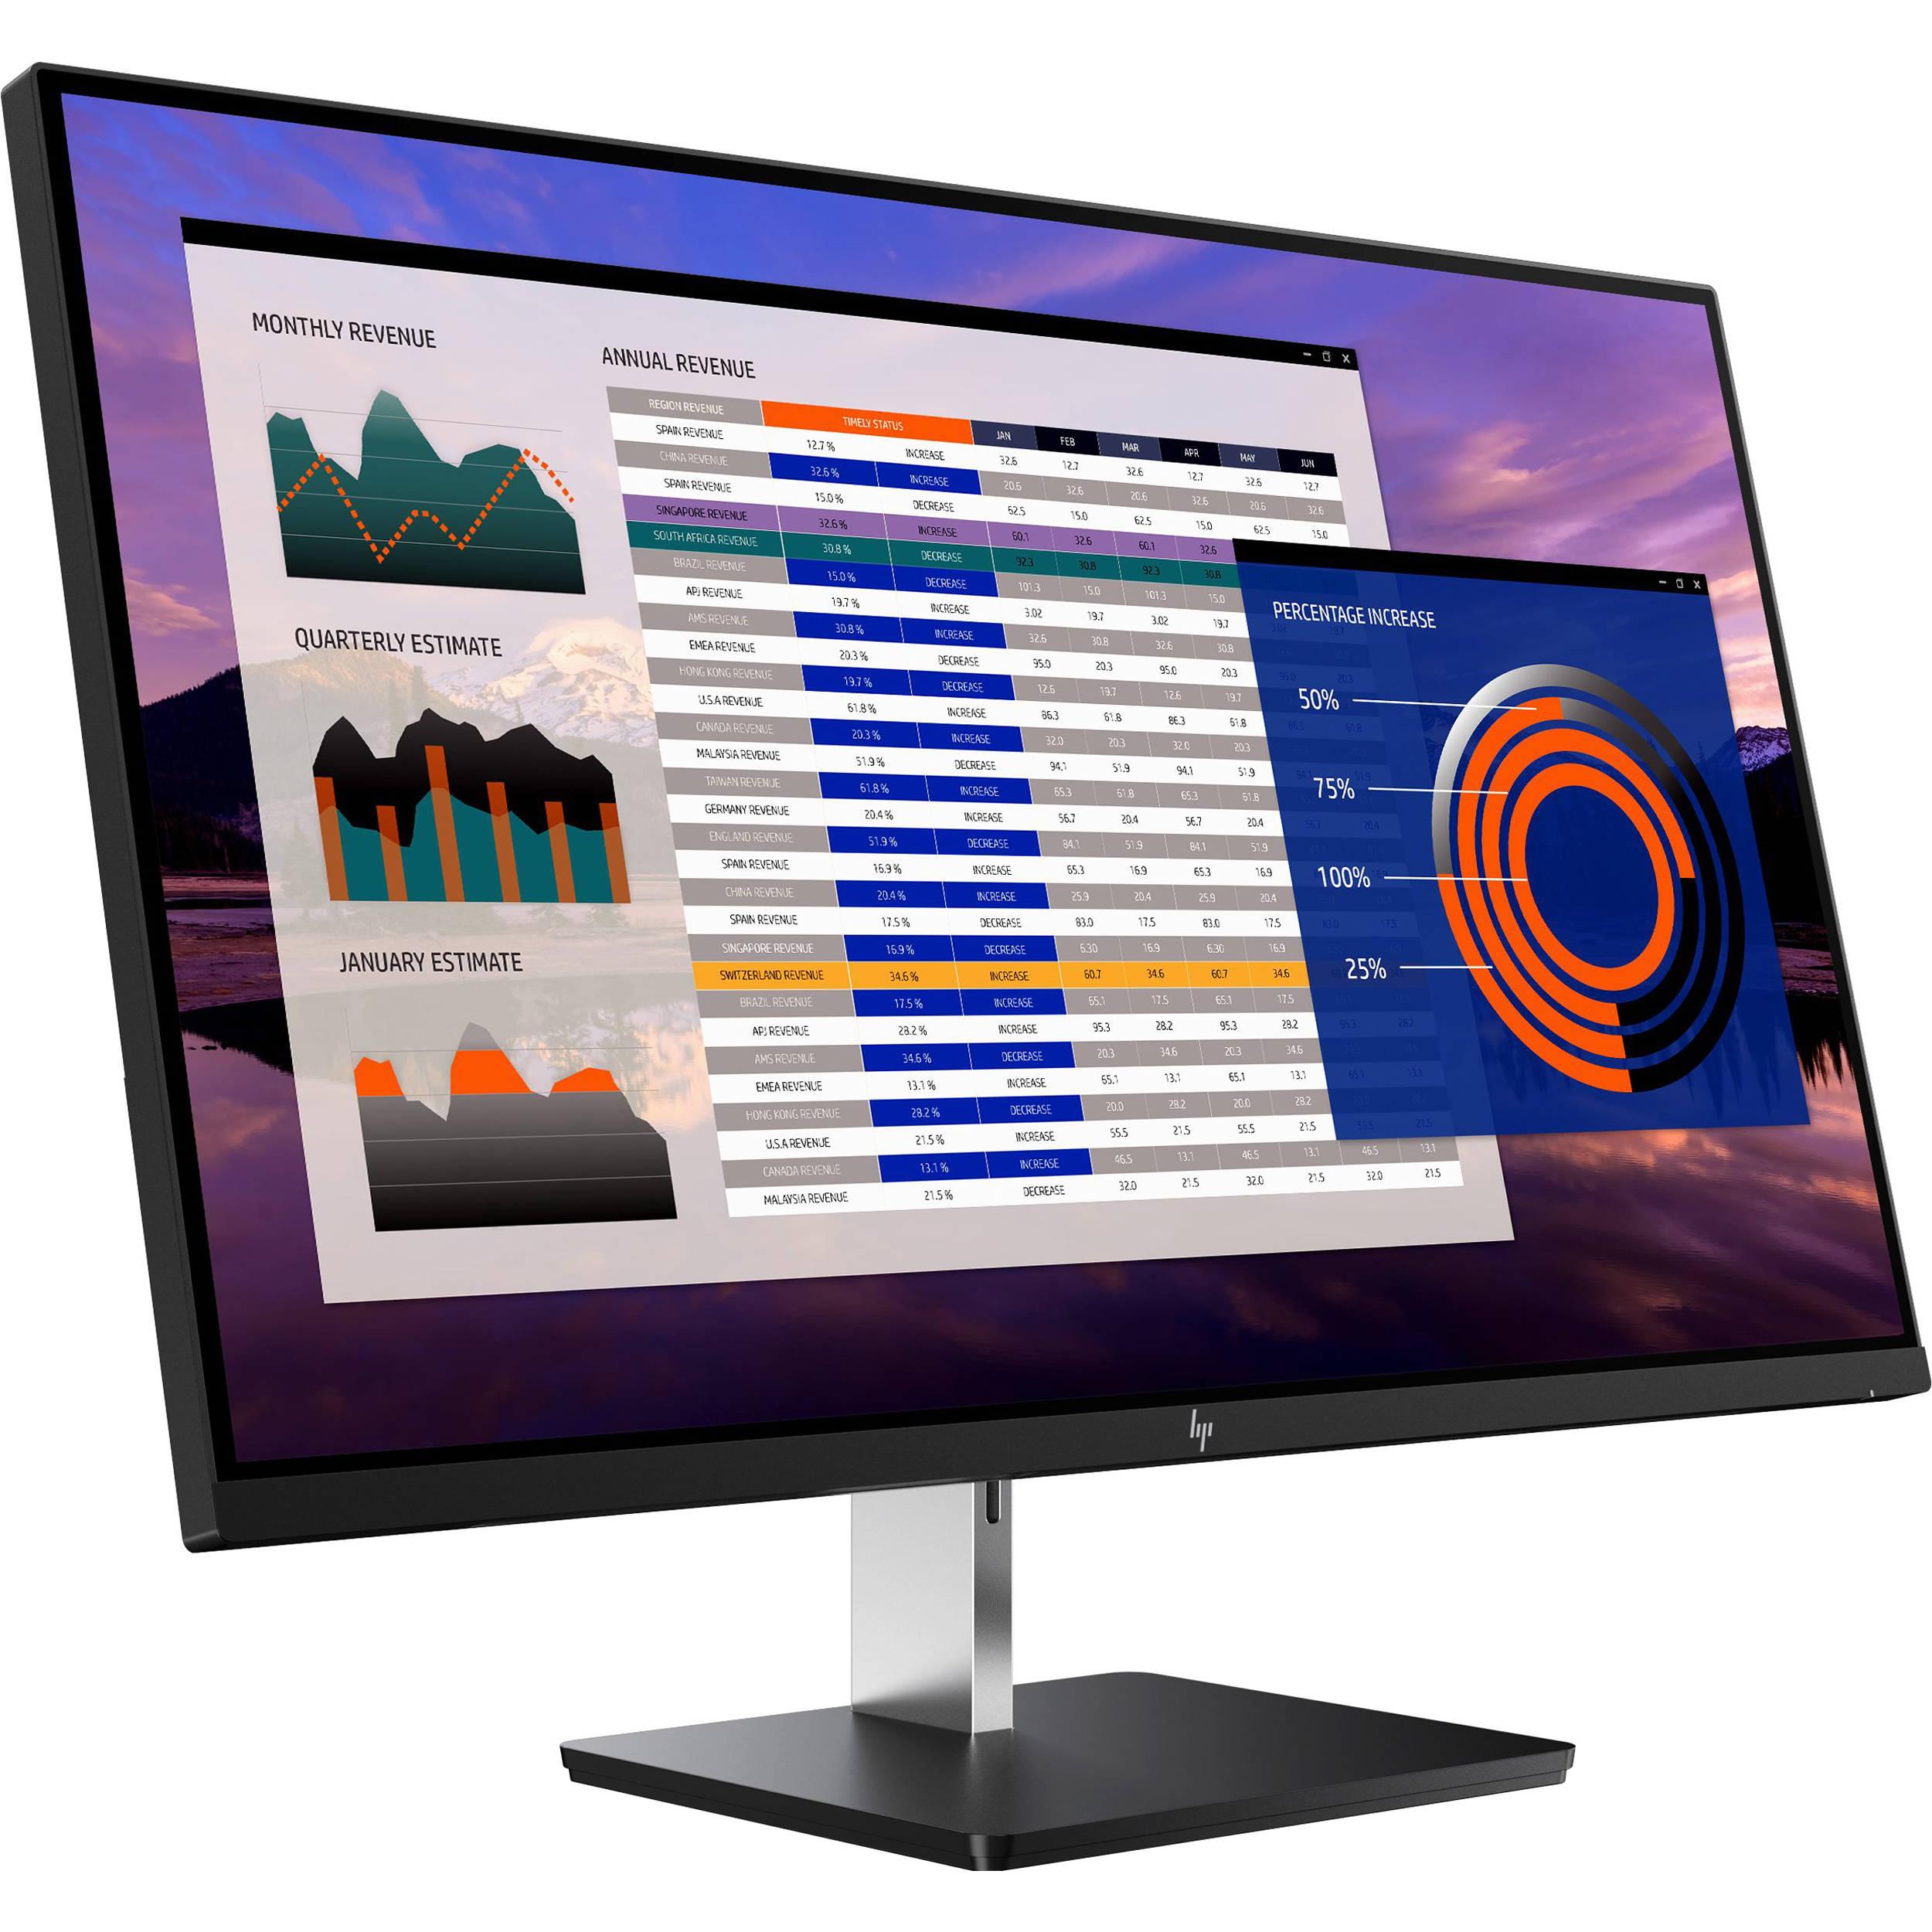 HP Elitedisplay S270n 27in 4K UHD 60Hz HDMI DP USB-C IPS LED Monitor $289.99